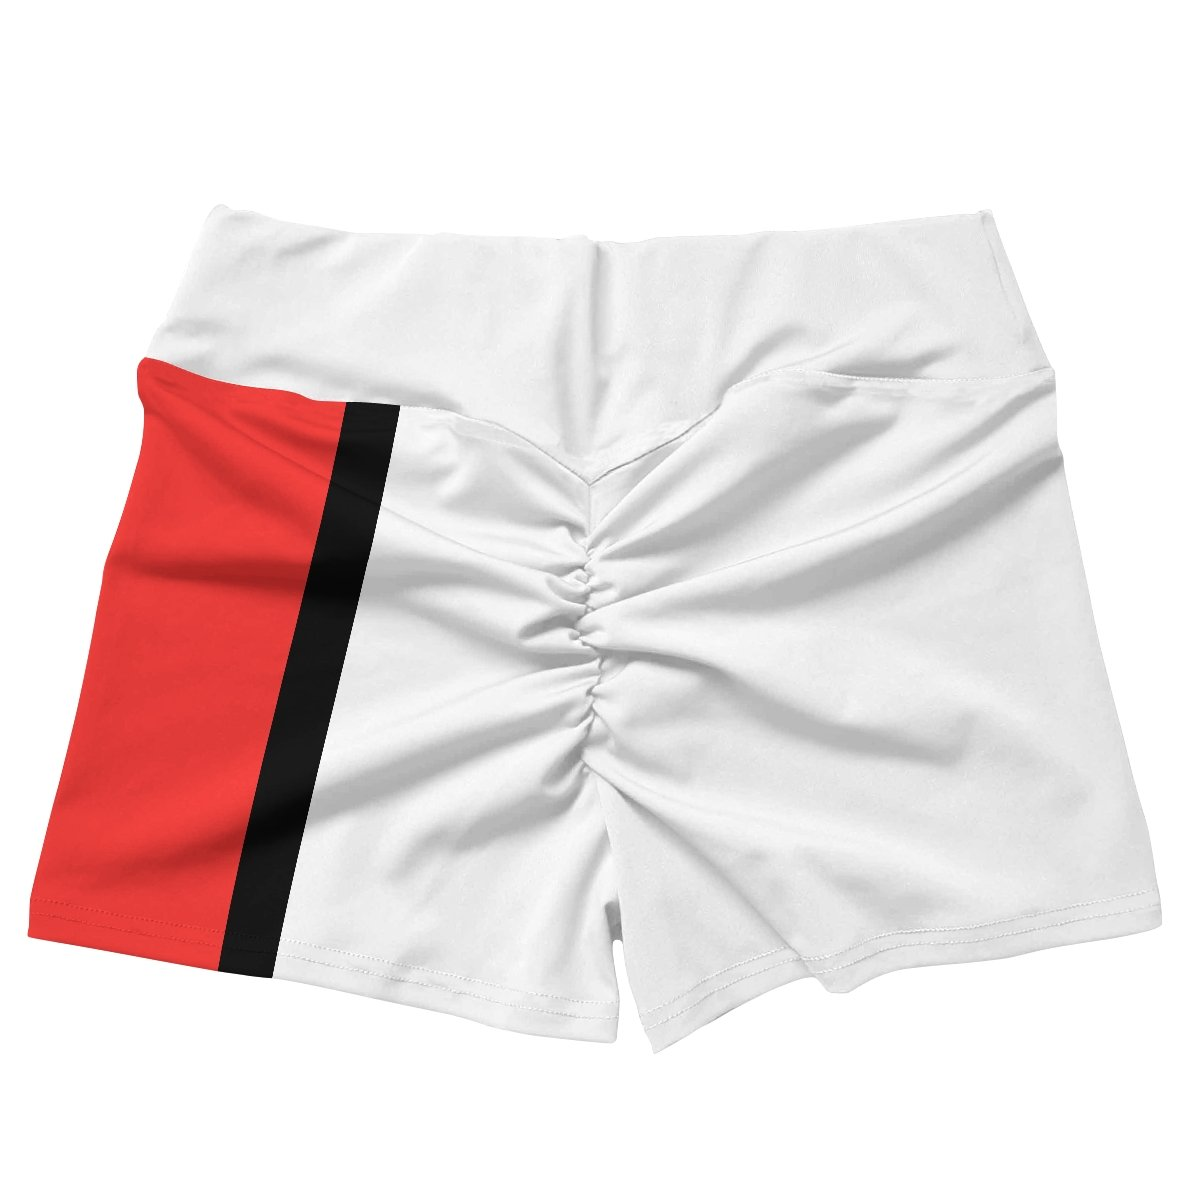 pokemon fire uniform active wear set 330482 - Anime Swimsuits